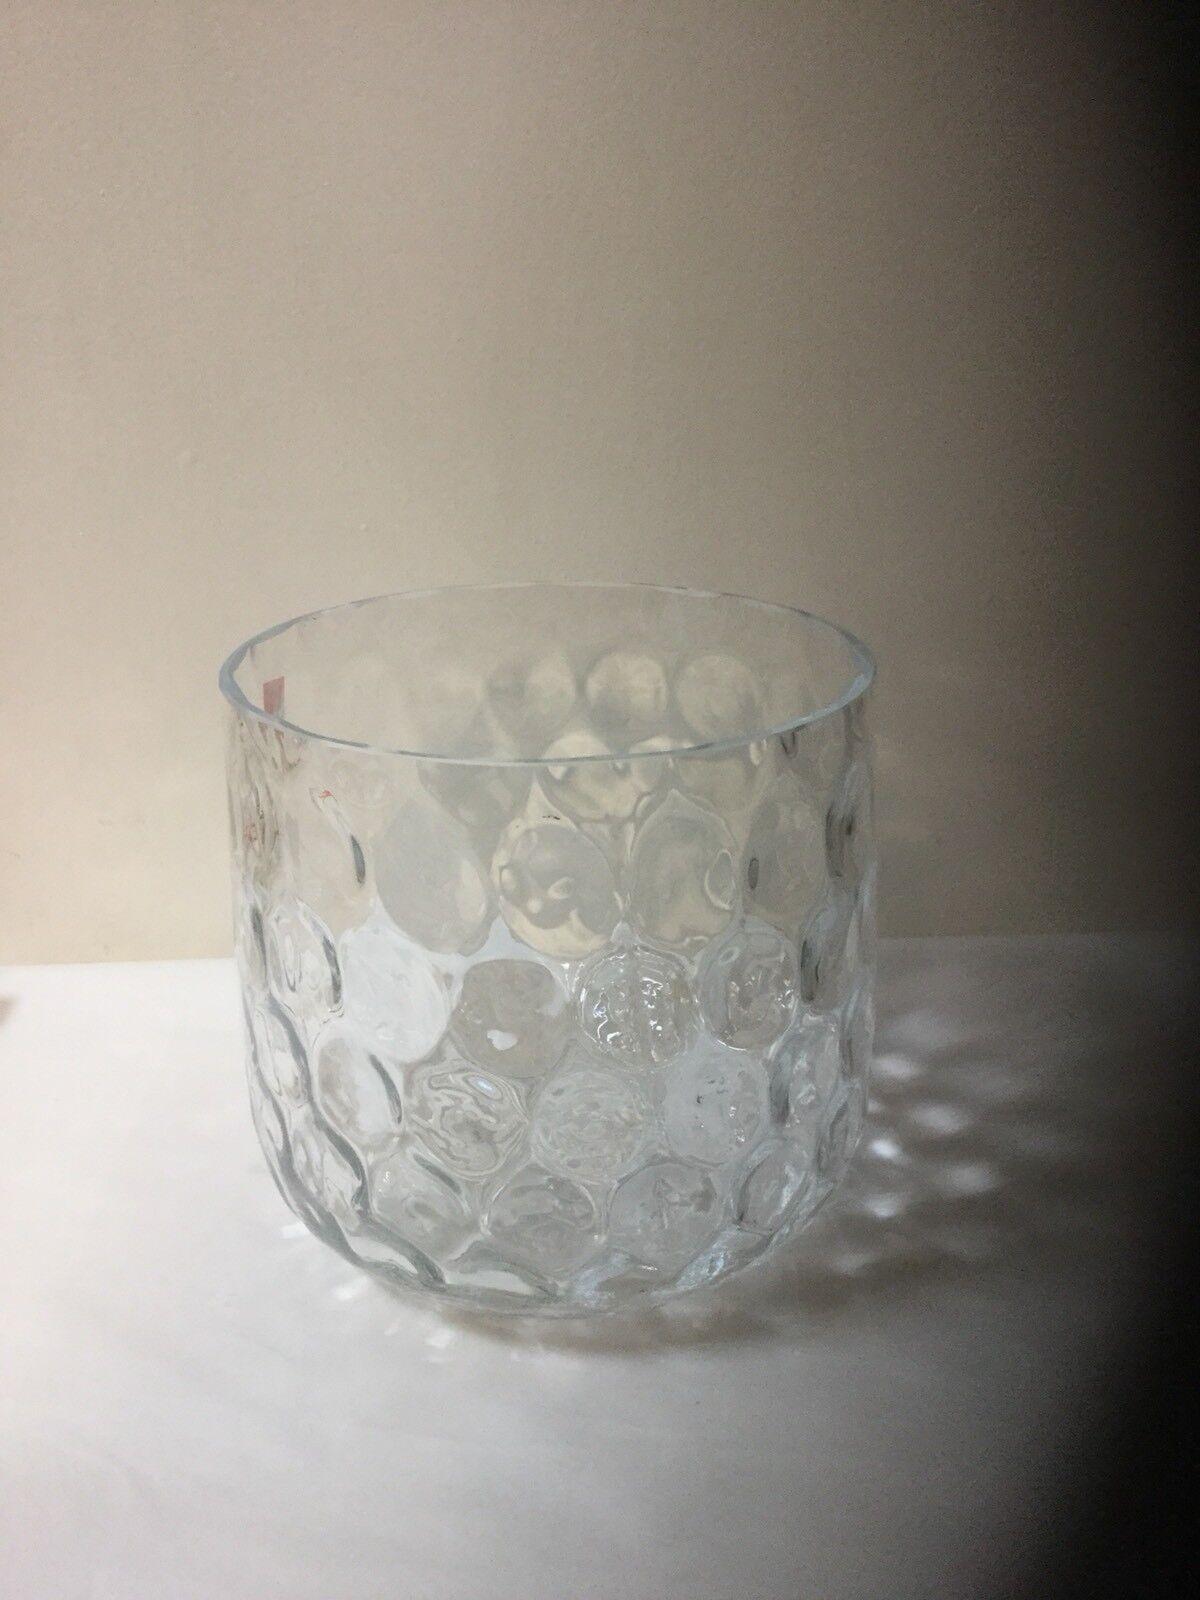 Windlicht Glas Vase Nic Nic Nic Duysens edle Homeware   Queensland  f0aadf